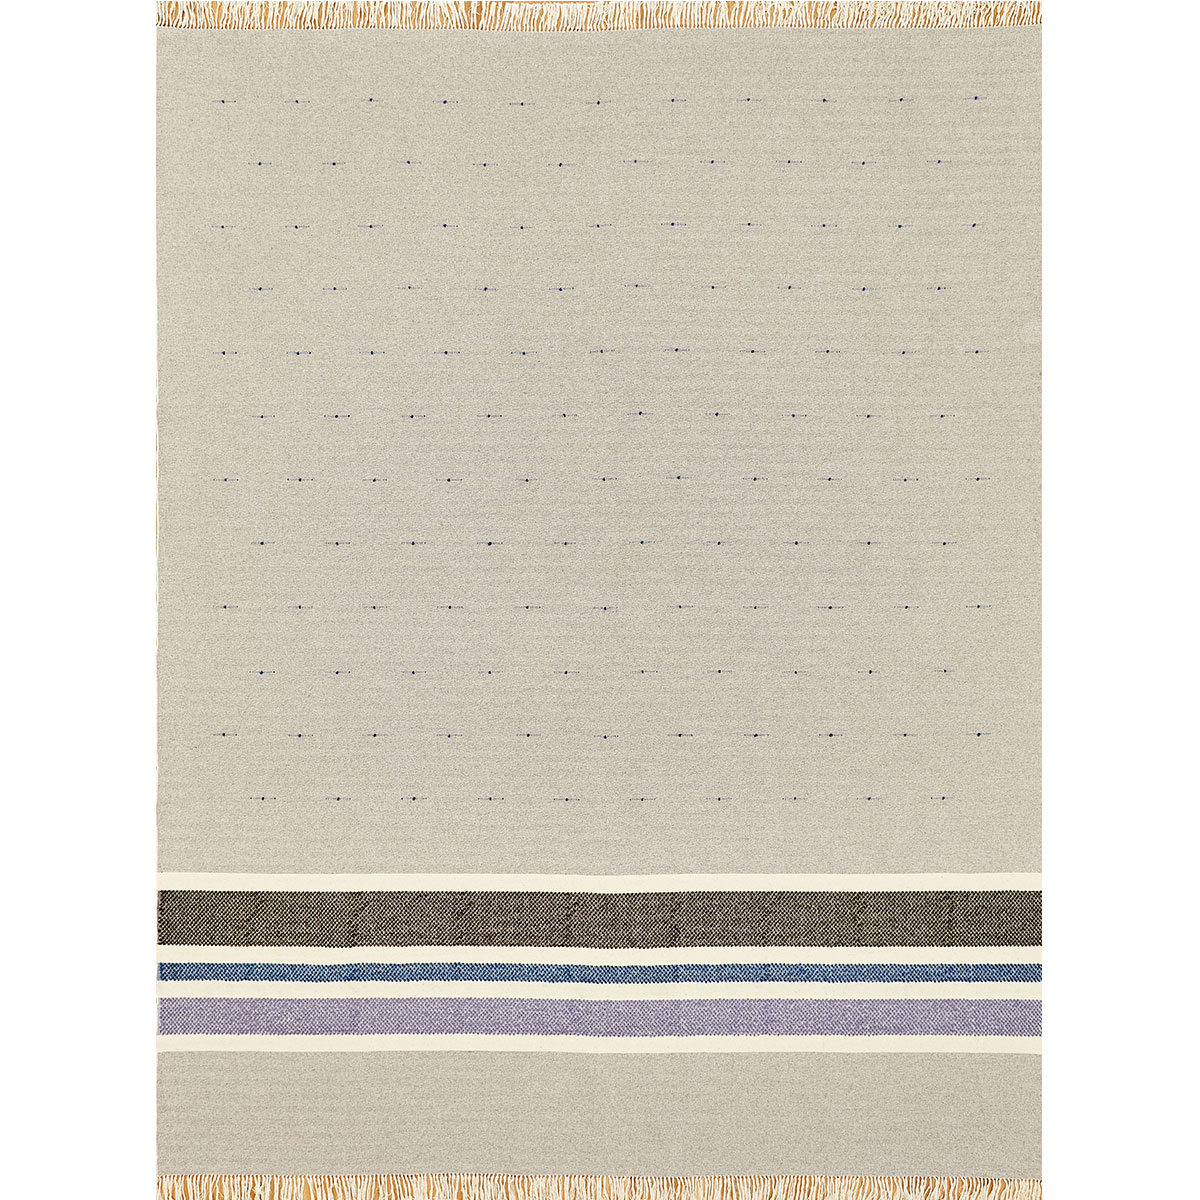 modesto_cotton-wool_hand-woven_patterson-flynn-martin_pfm